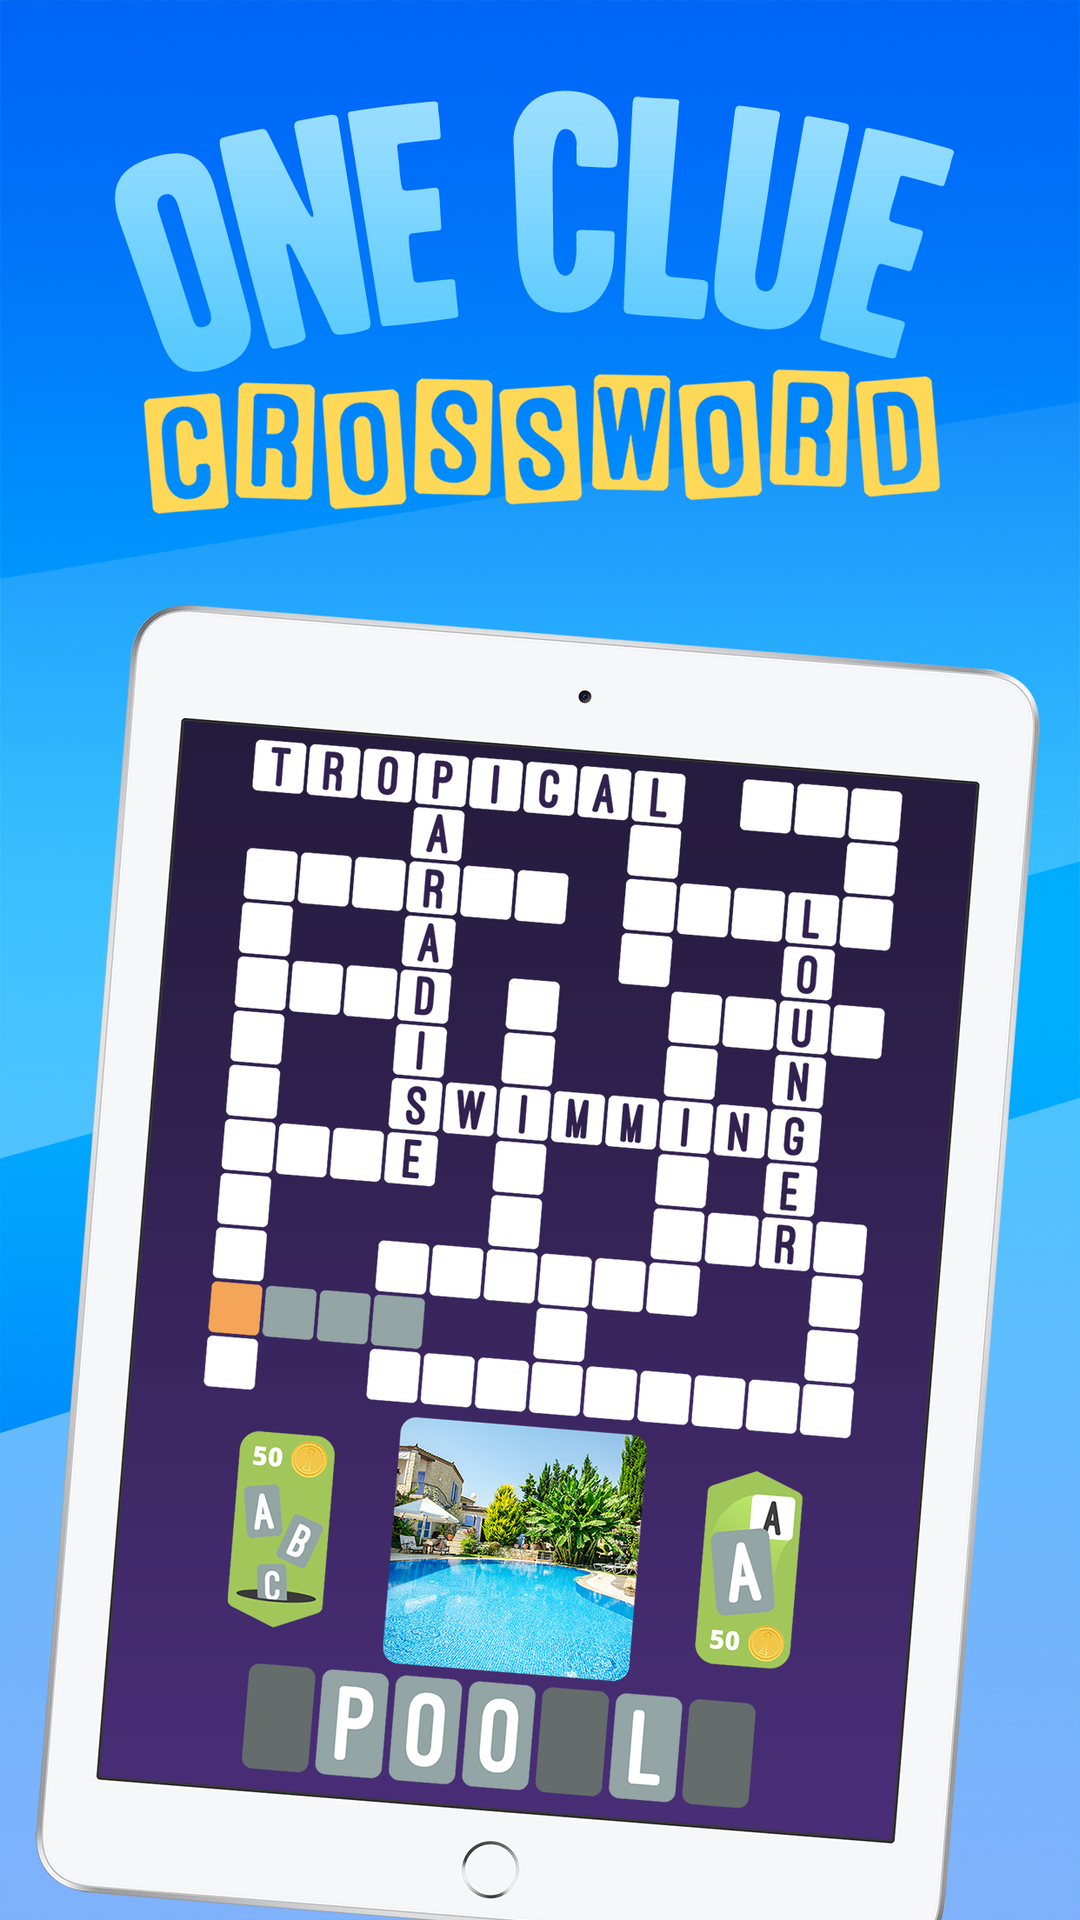 Watch Video  sc 1 st  Amazon.com & Amazon.com: One Clue Crossword : 100s of great free crosswords ... 25forcollege.com